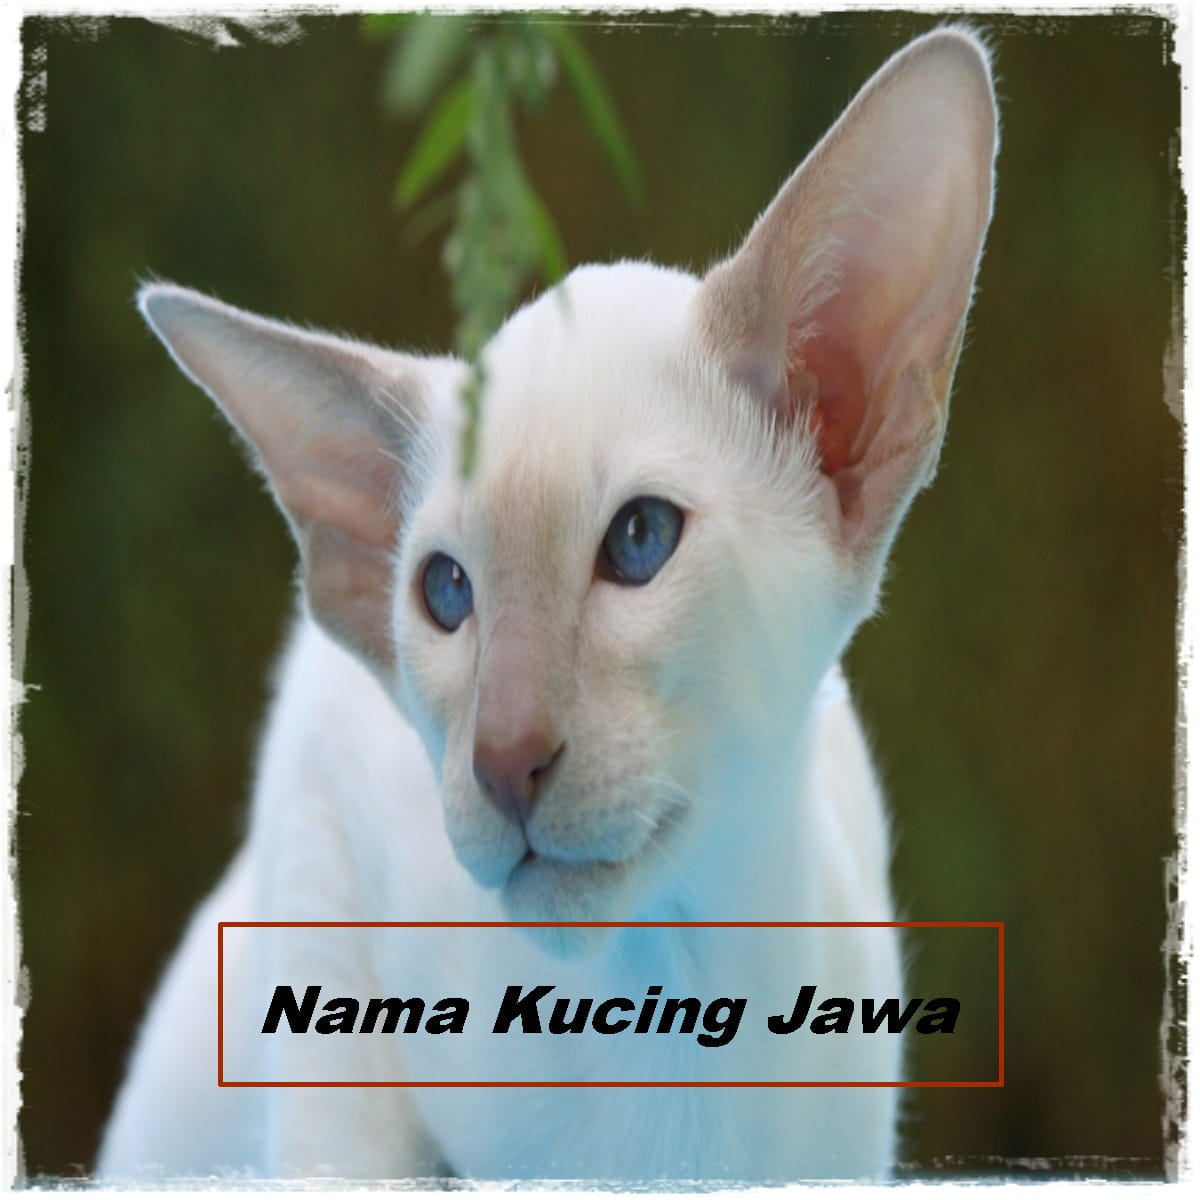 Nama Kucing Jawa